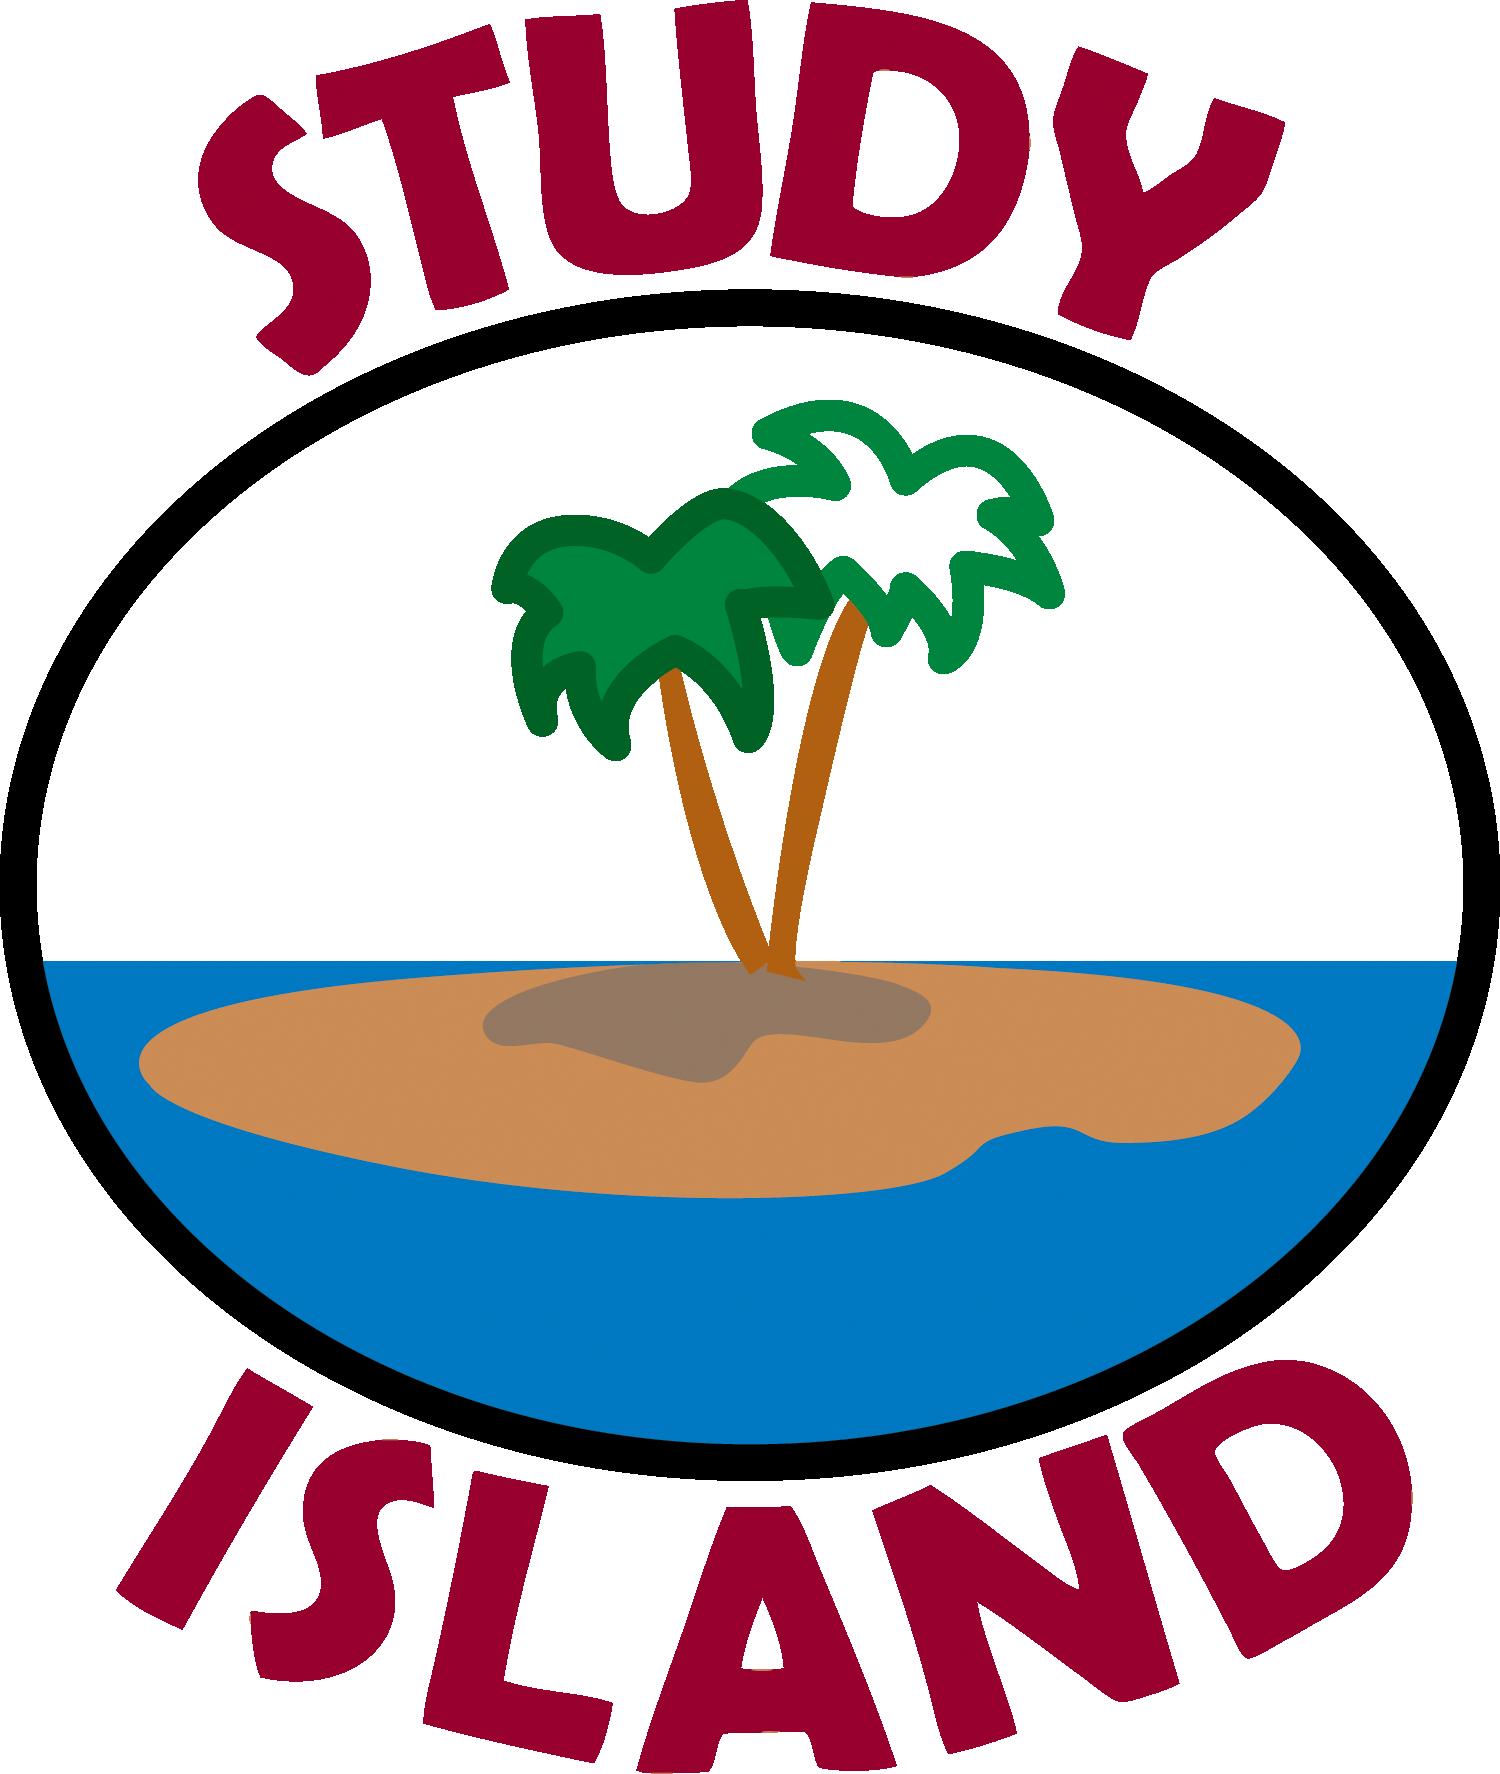 Study clipart writing. Island ponderosa elementary school